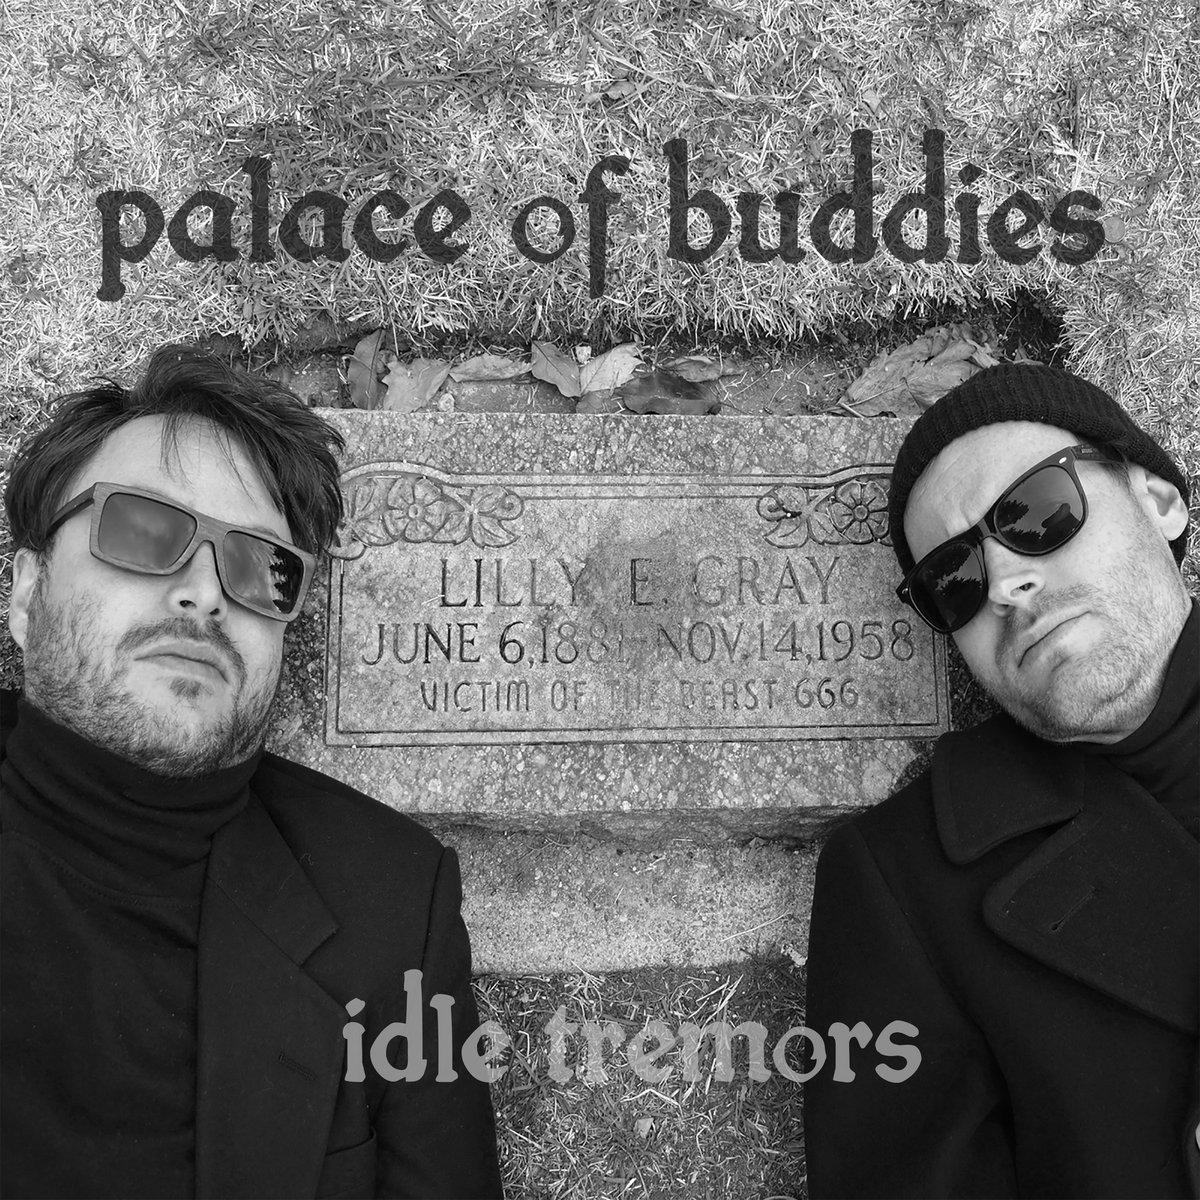 Palace of Buddies | Idle Tremors | Kilby Records